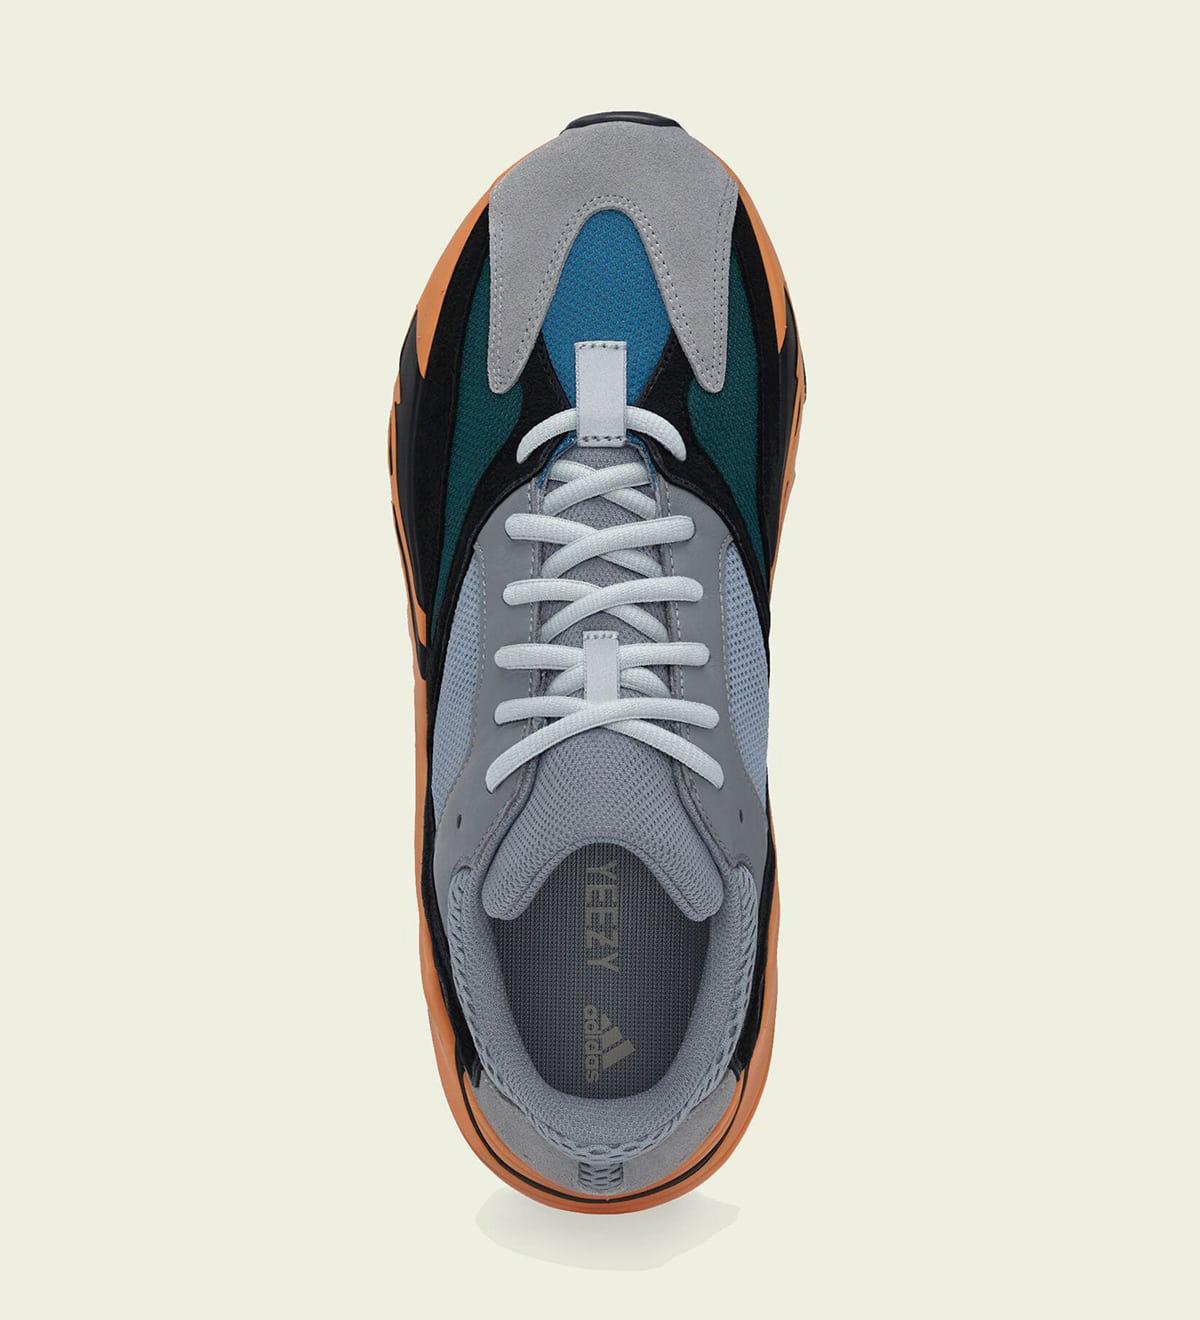 adidas-yeezy-boost-700-wash-orange-3